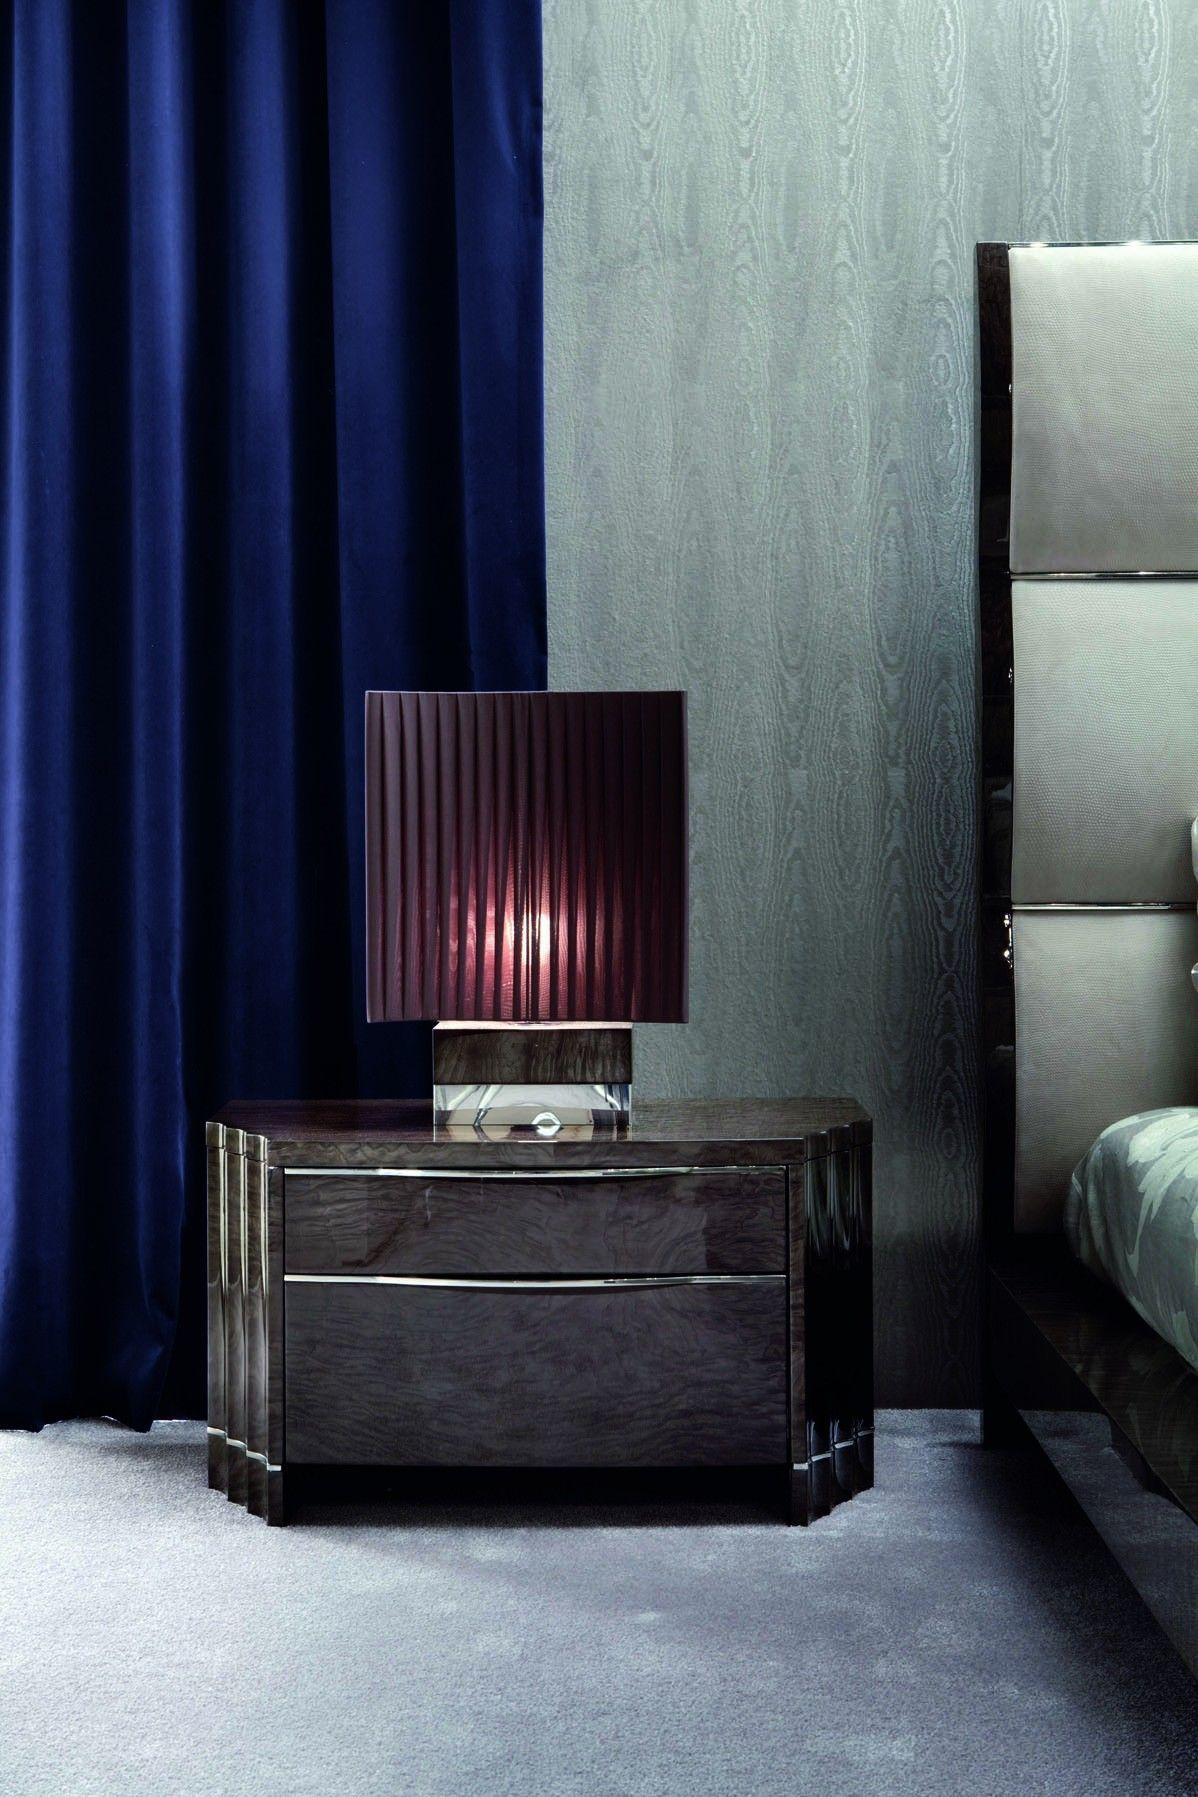 Giorgio Absolute Bedroom Night Stand 430 Goruntuler Ile Yatak